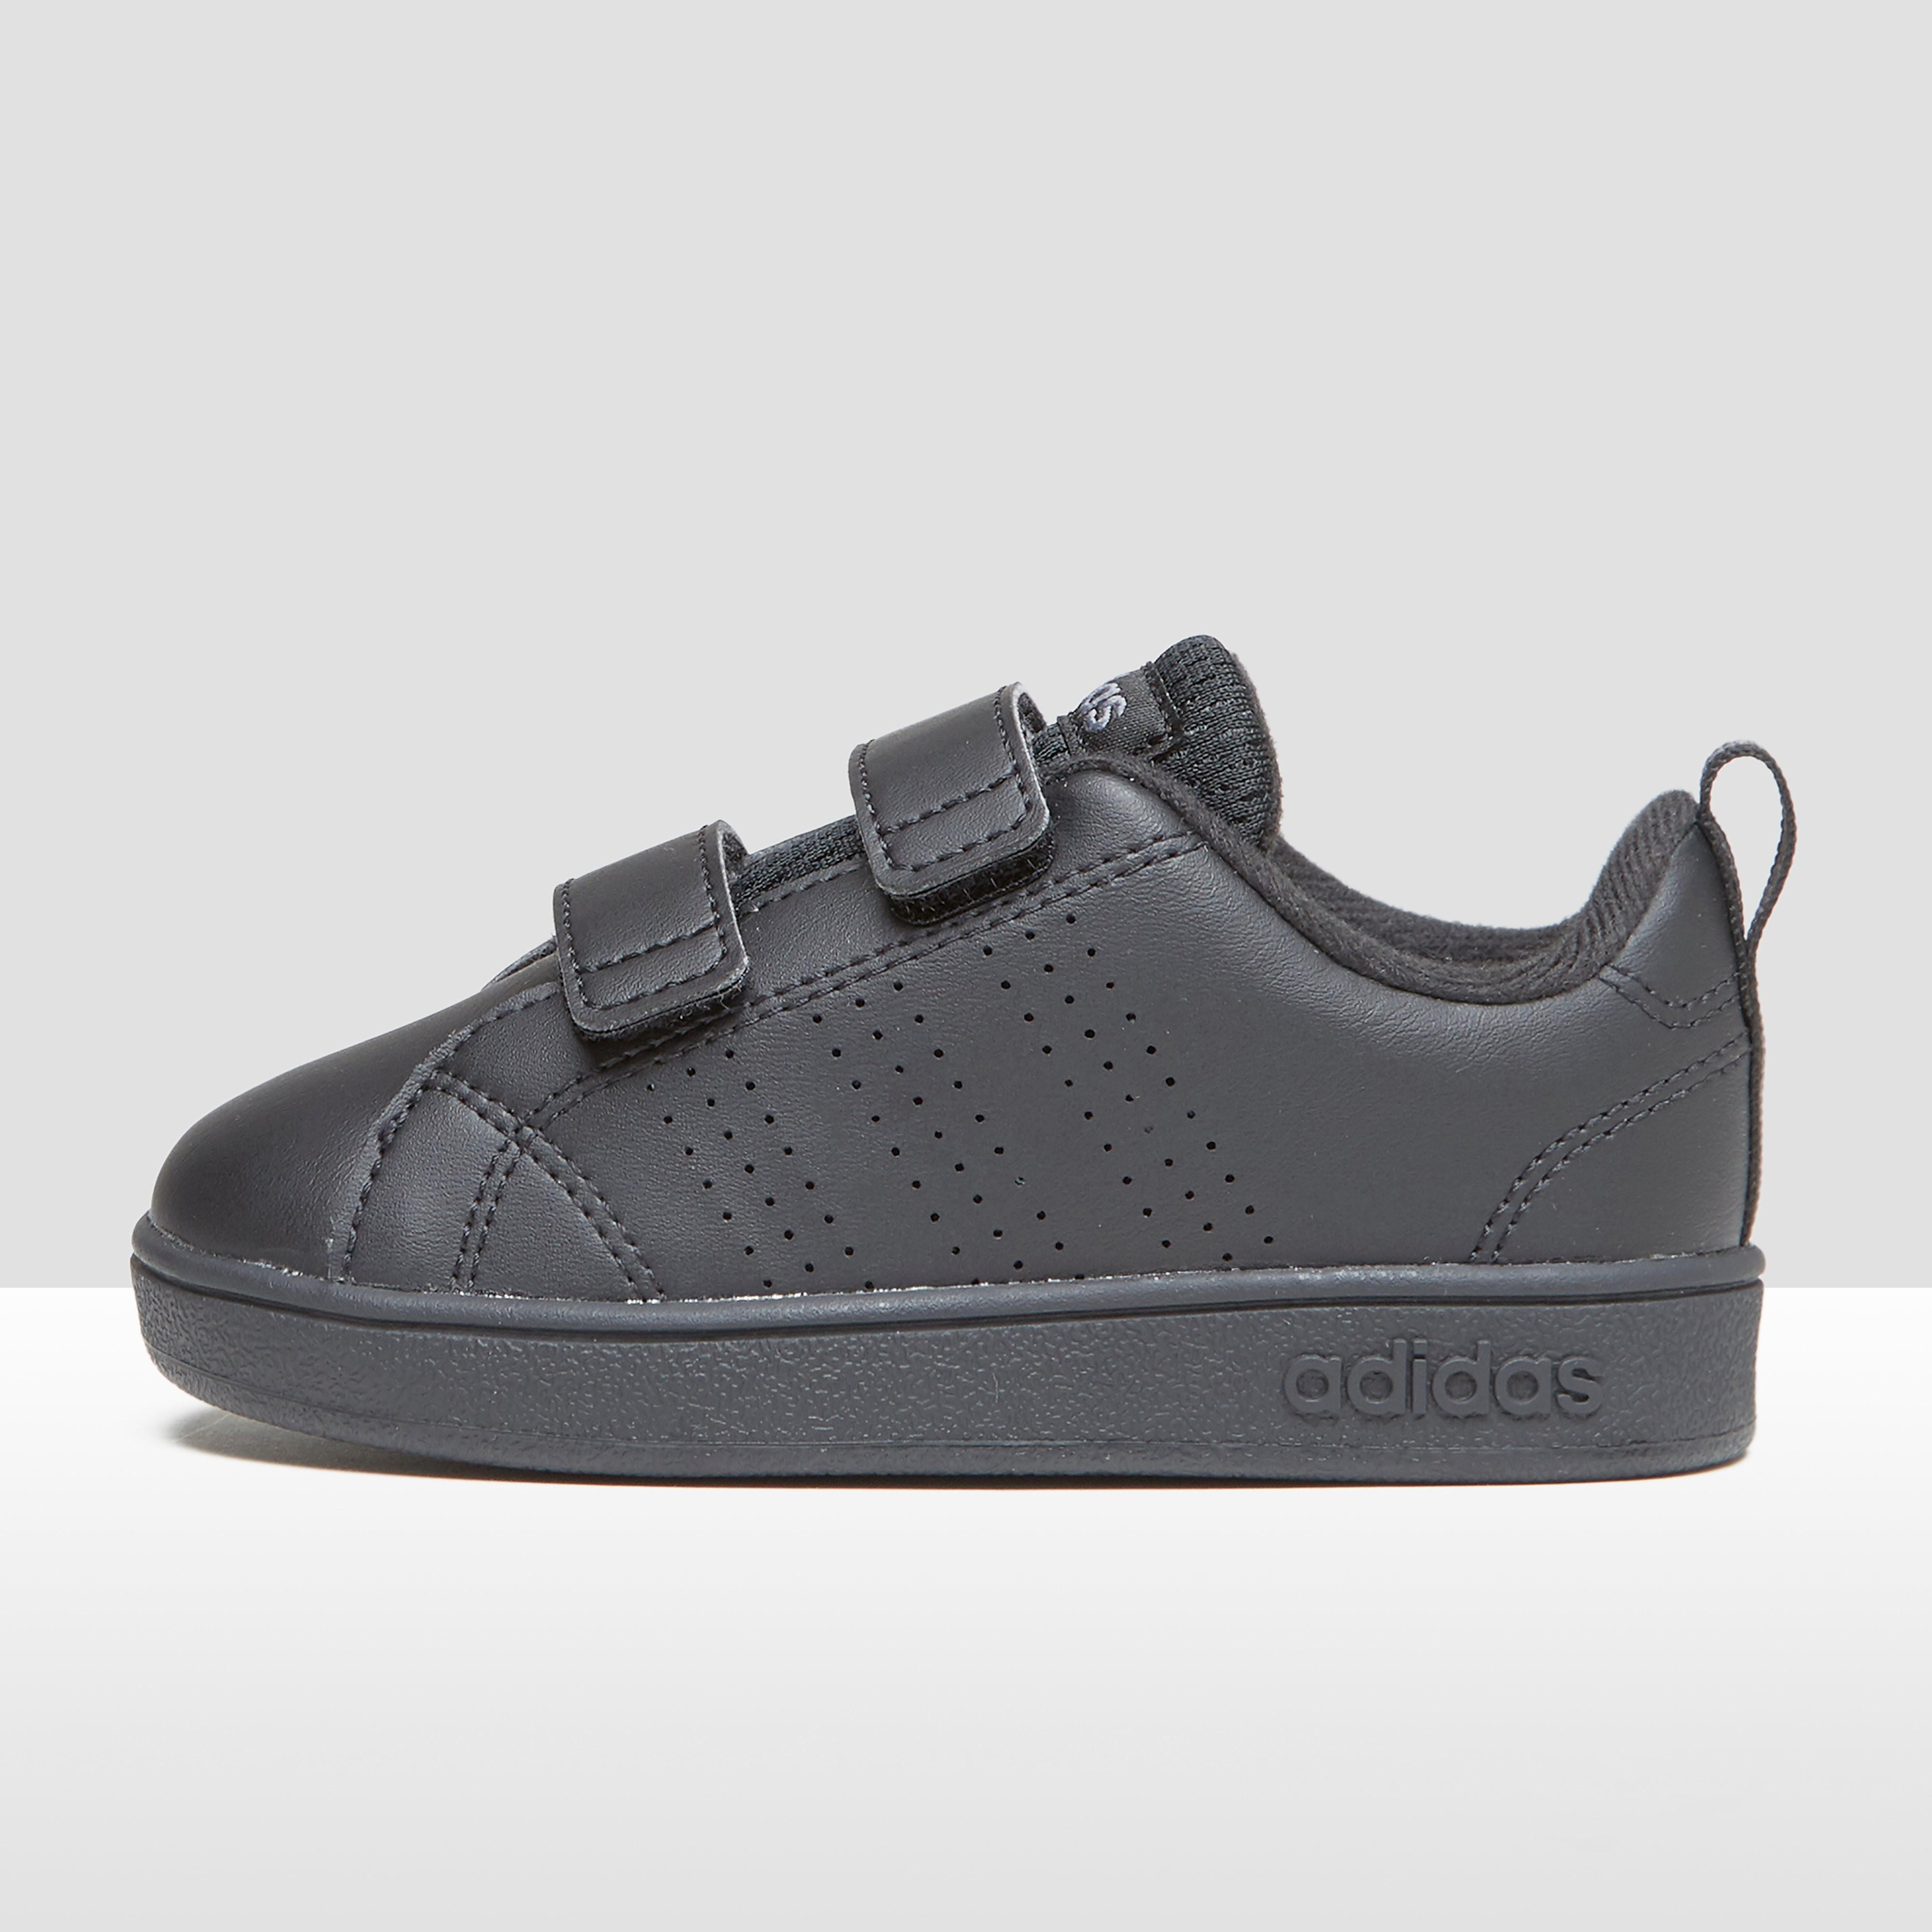 adidas VS ADVANTAGE CLEAN CMF IN